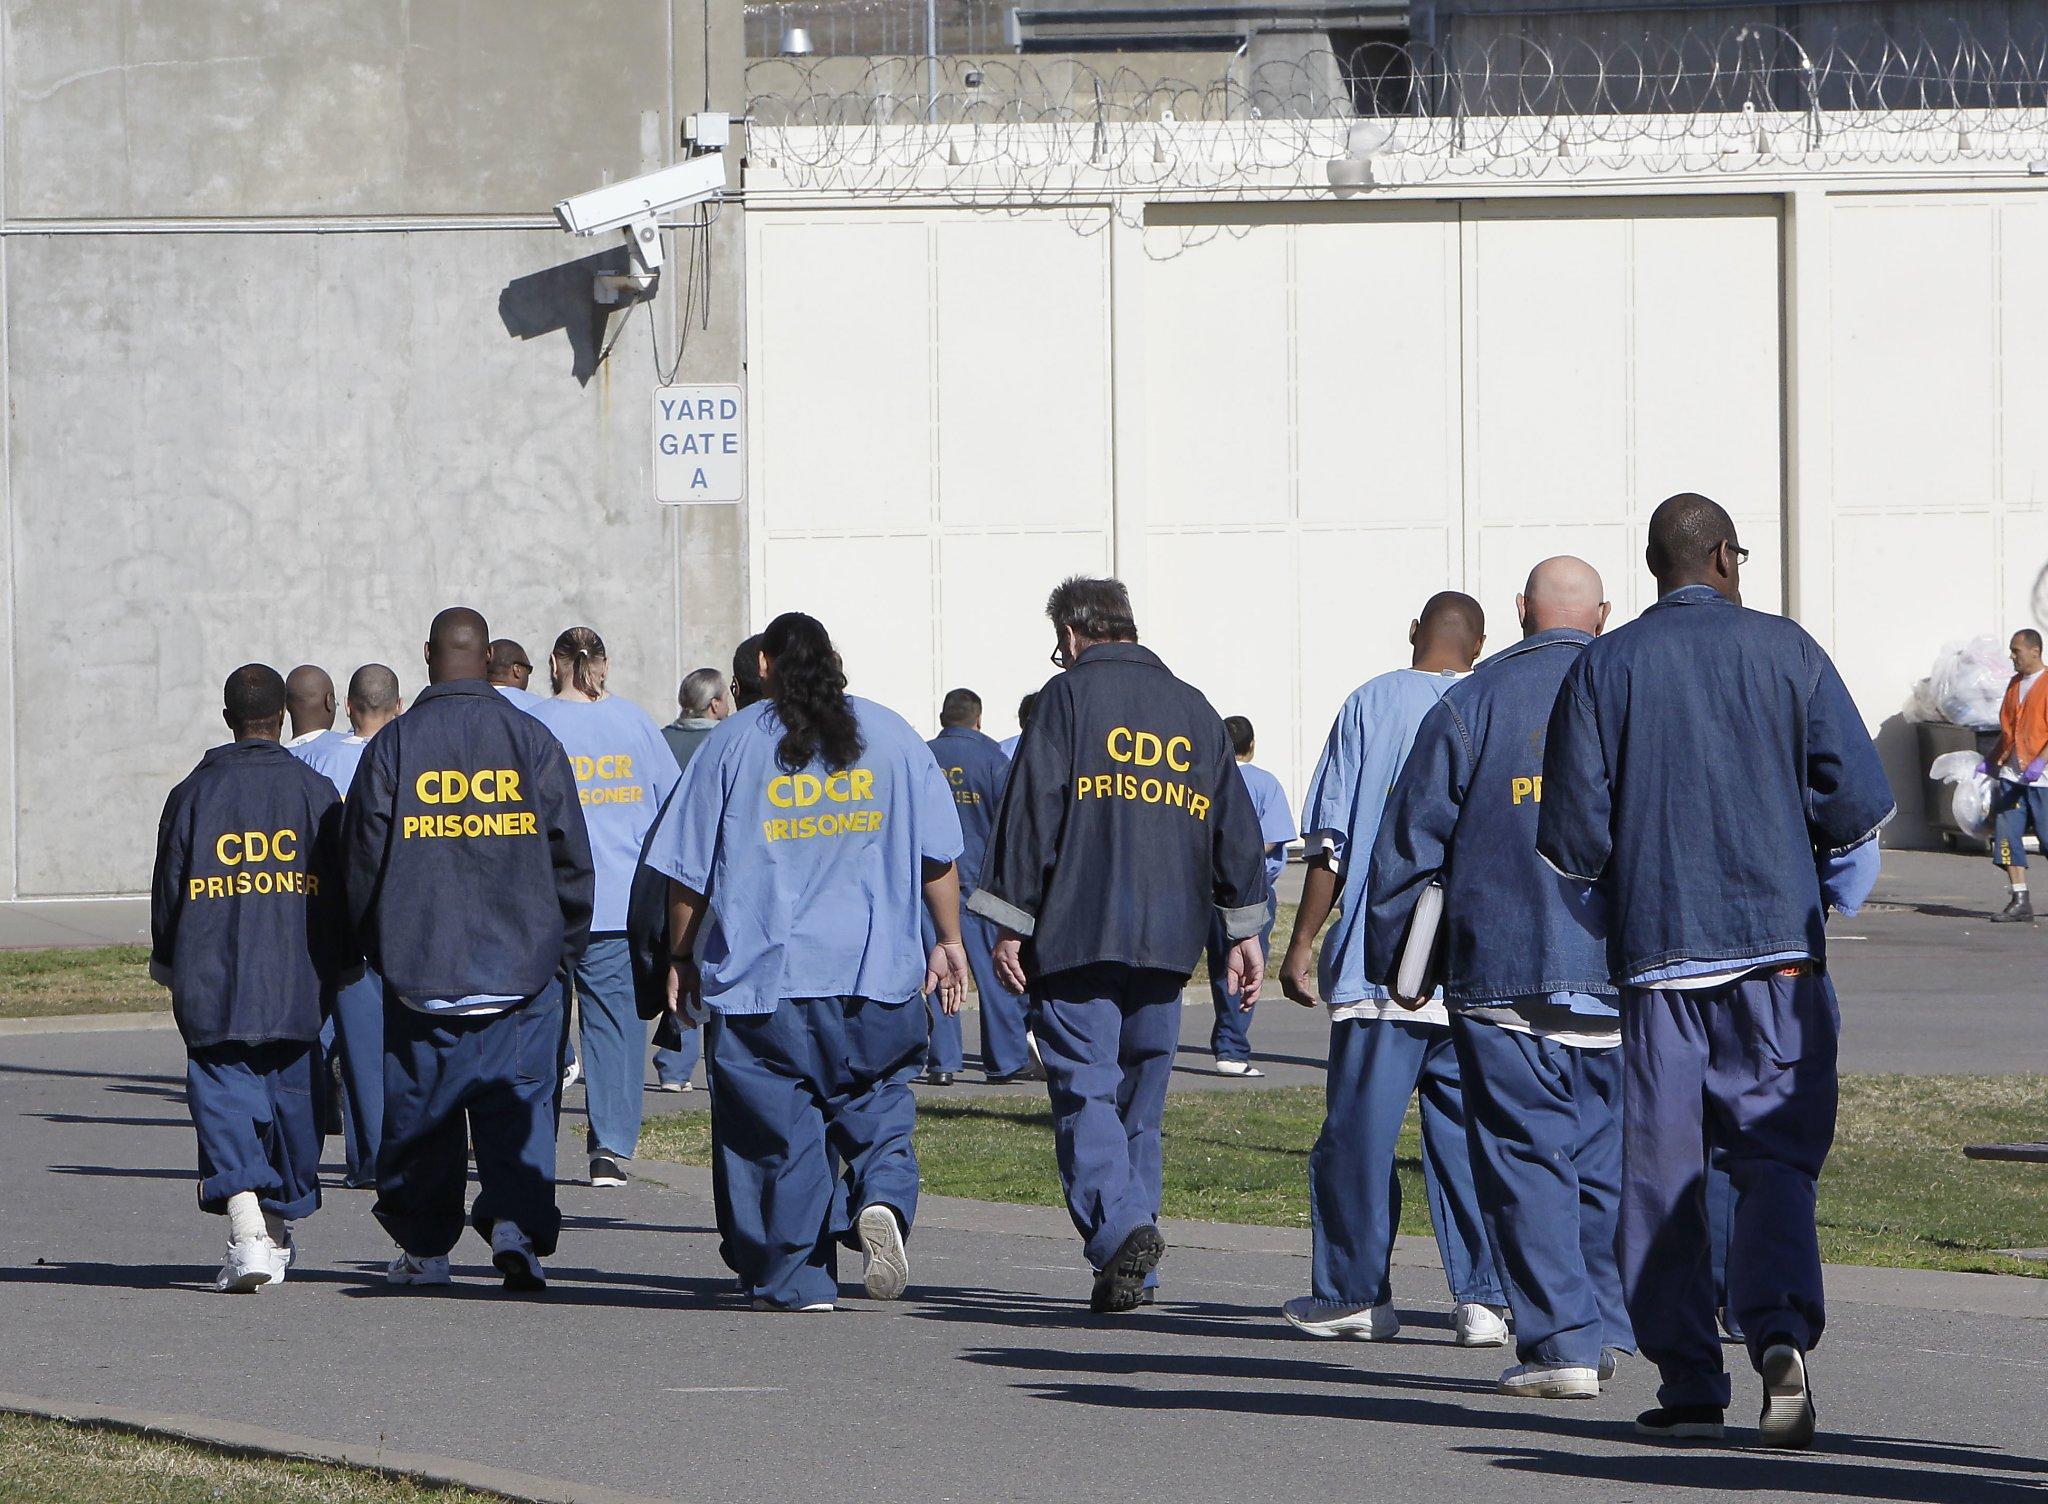 Gavin Newsom wants to close prisons as coronavirus shreds California's budget - San Francisco Chronicle